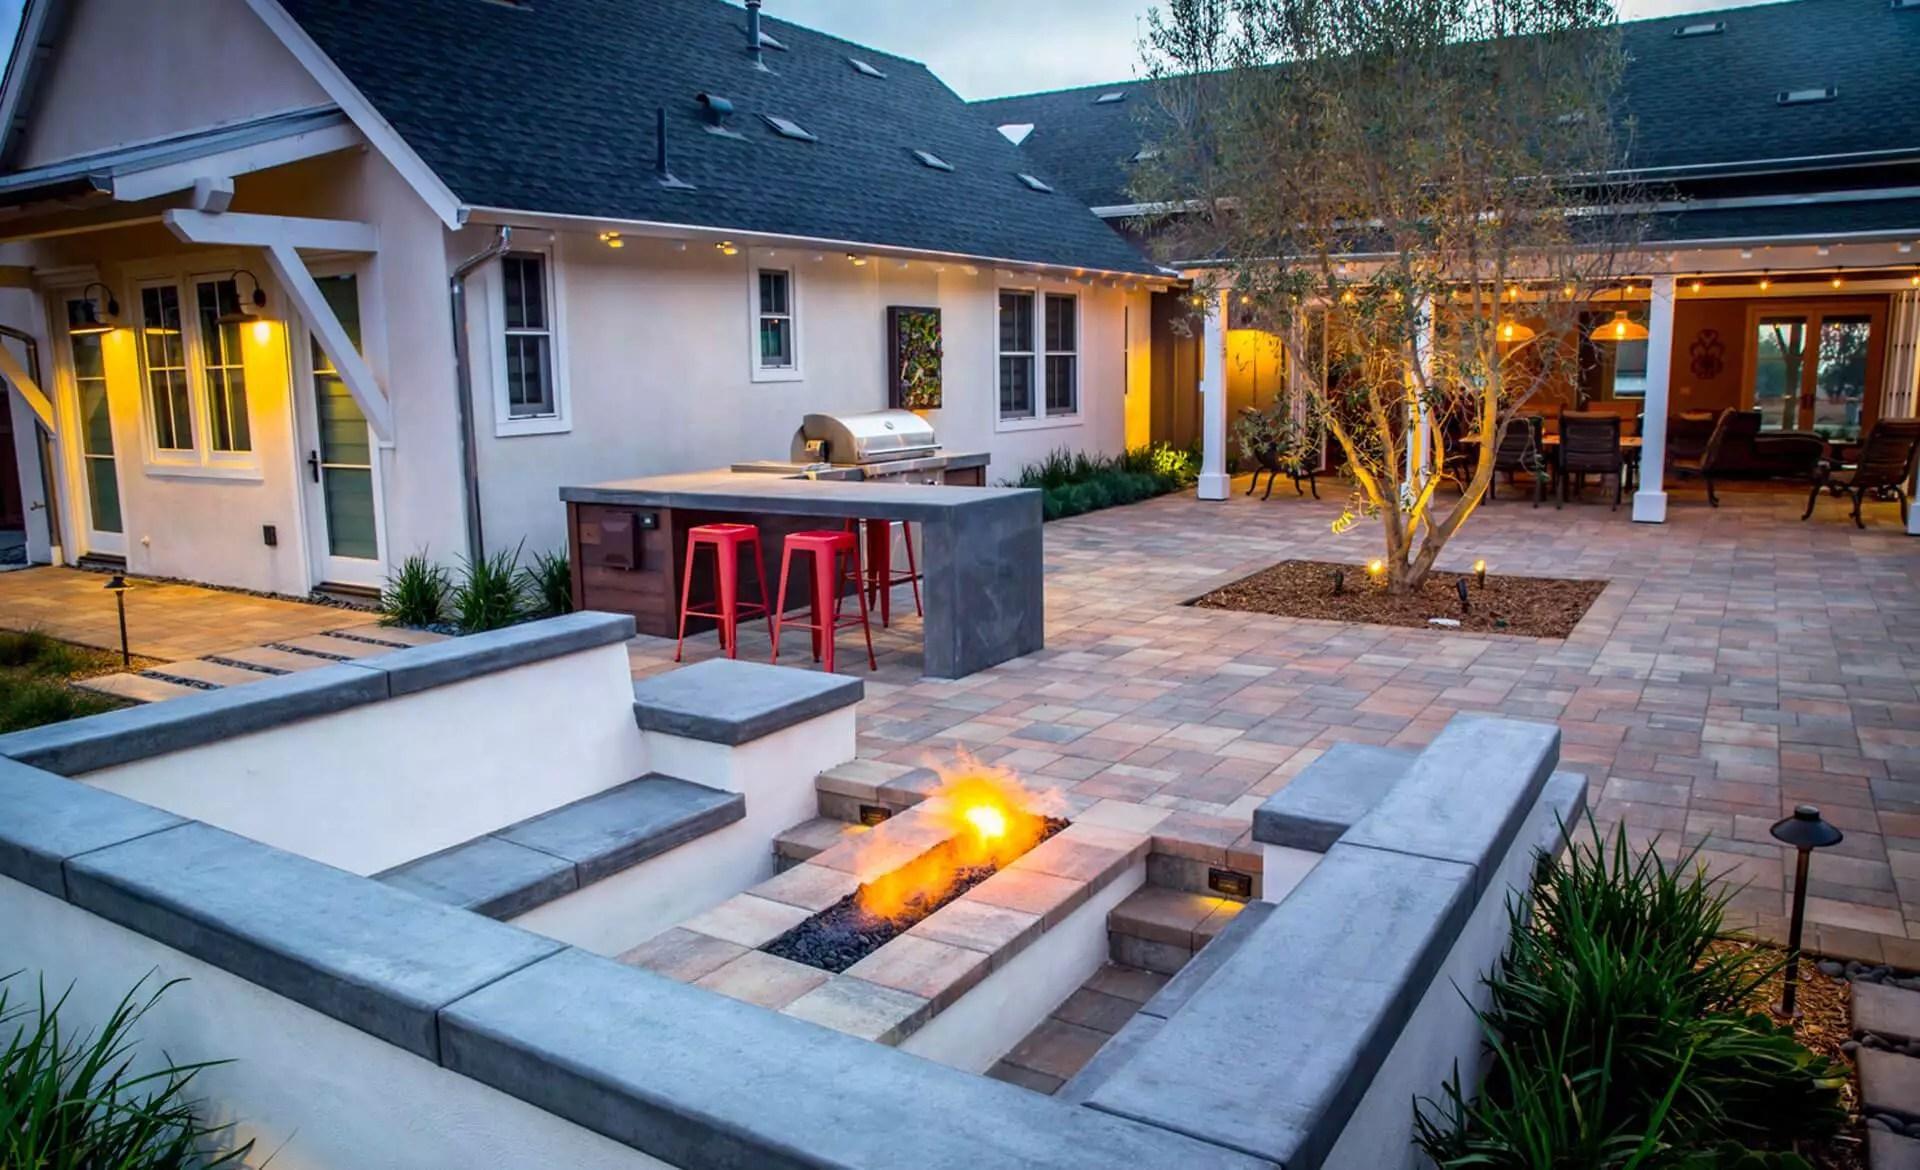 Hardscape Design in San Diego, CA   Backyard Design ... on Hardscape Backyard id=22842